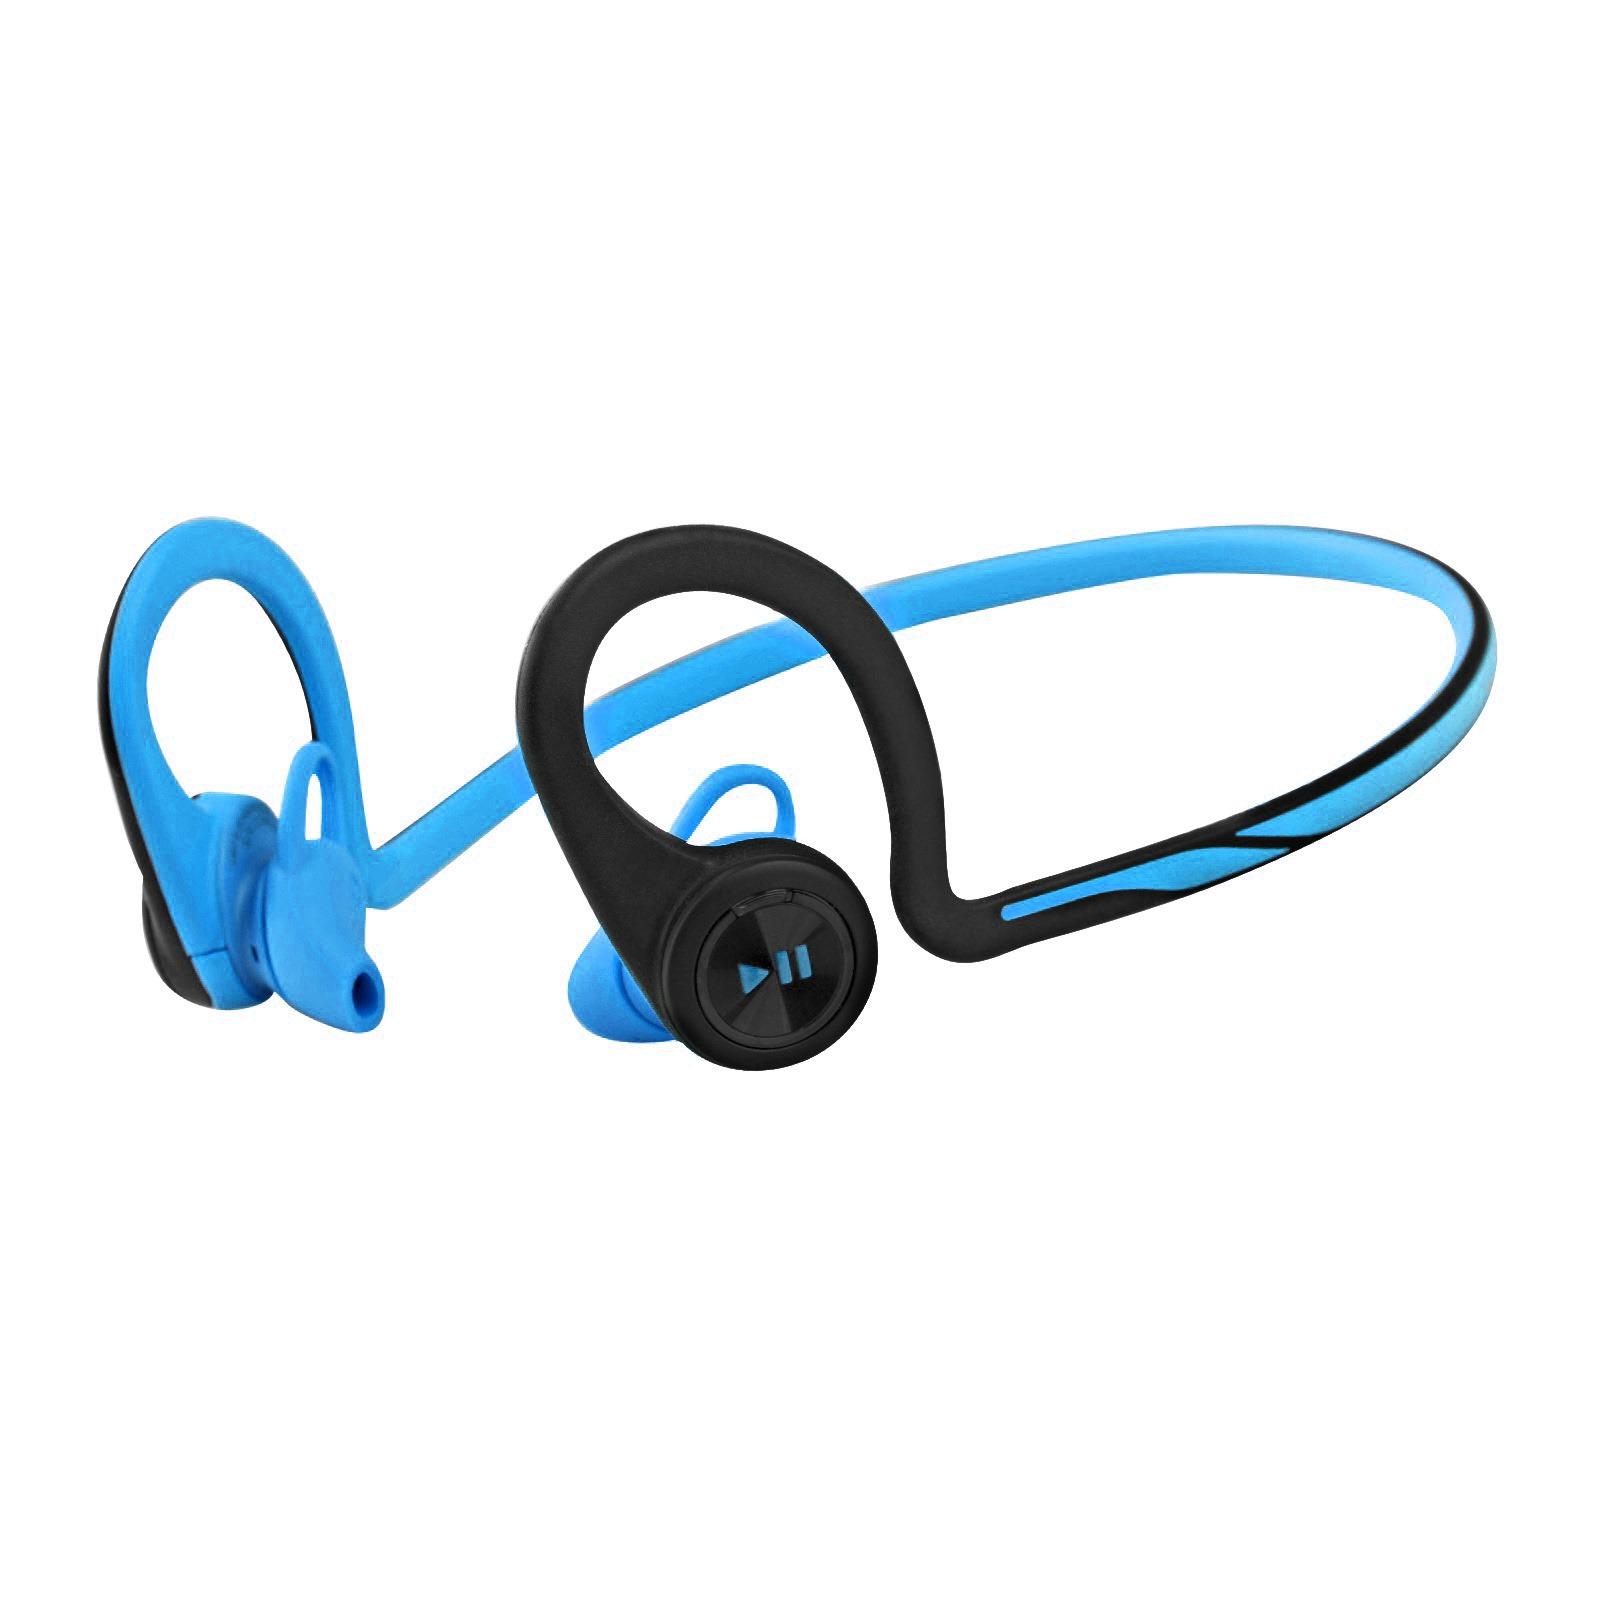 Plantronics Backbeat Fit Wireless Headphones and Microphone (Blue) PLA-BACKBEATFIT-BL-C1